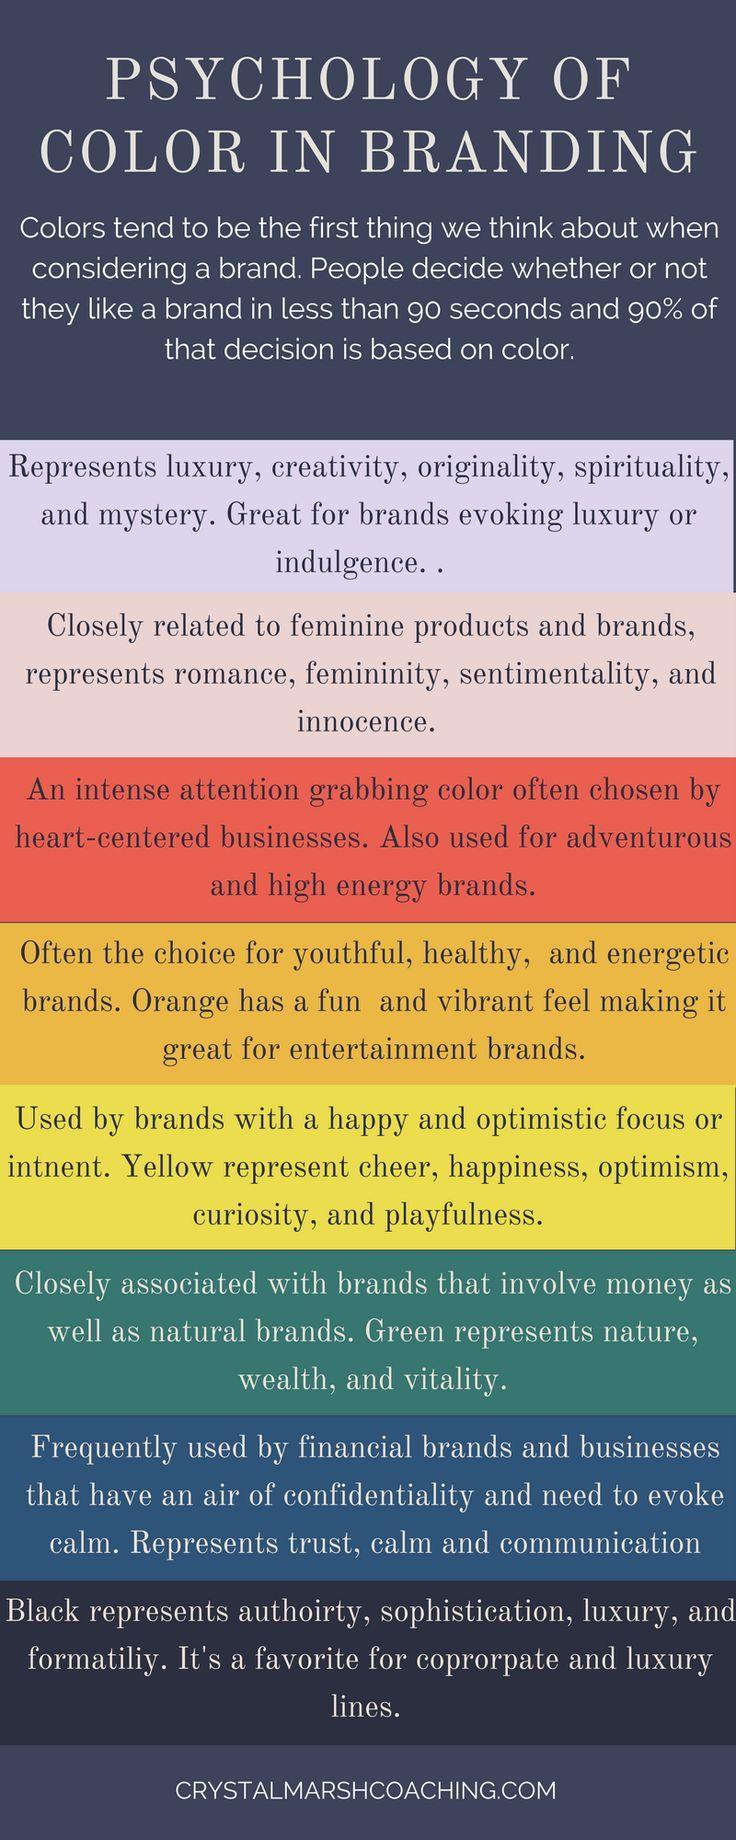 How to establish brand clarity and consistency blogging boost branding branding colors branding color psychology branding schemes branding colour palette branding colors mood boards branding colors inspiration altavistaventures Gallery